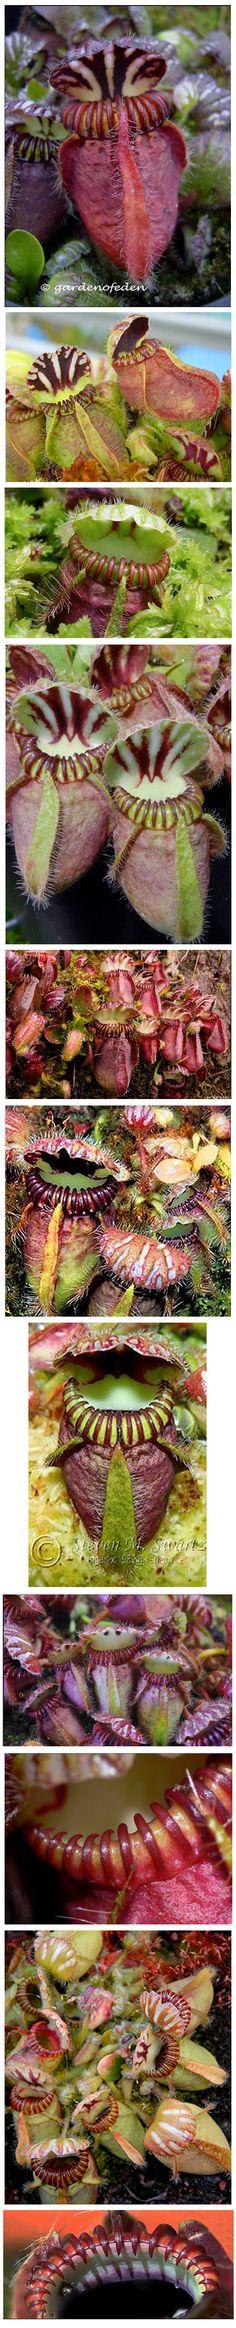 Cephalotus sp. Carnivorous Plants